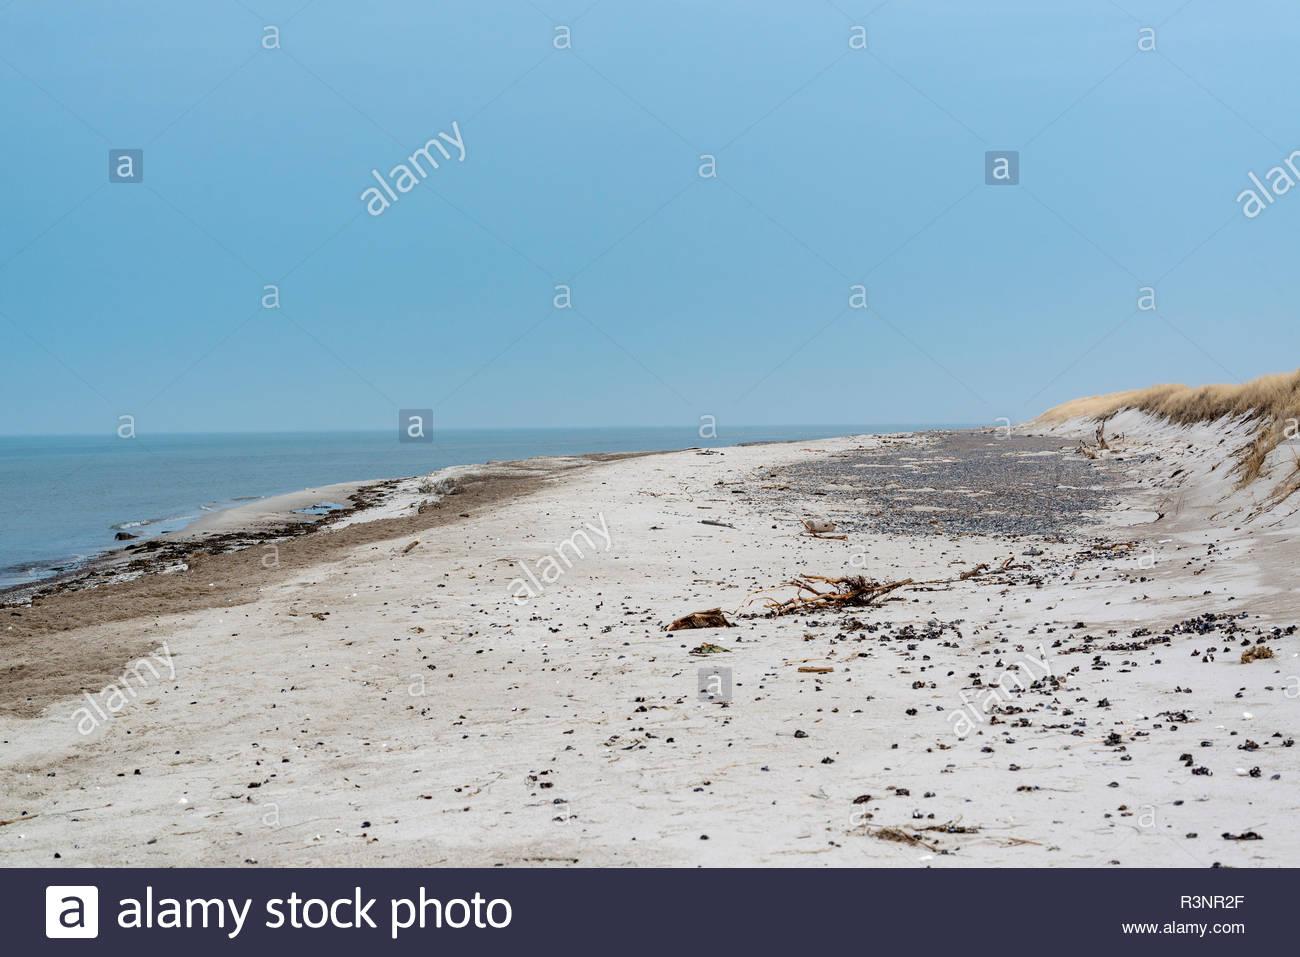 Menschenleerer Strand - Stock Image